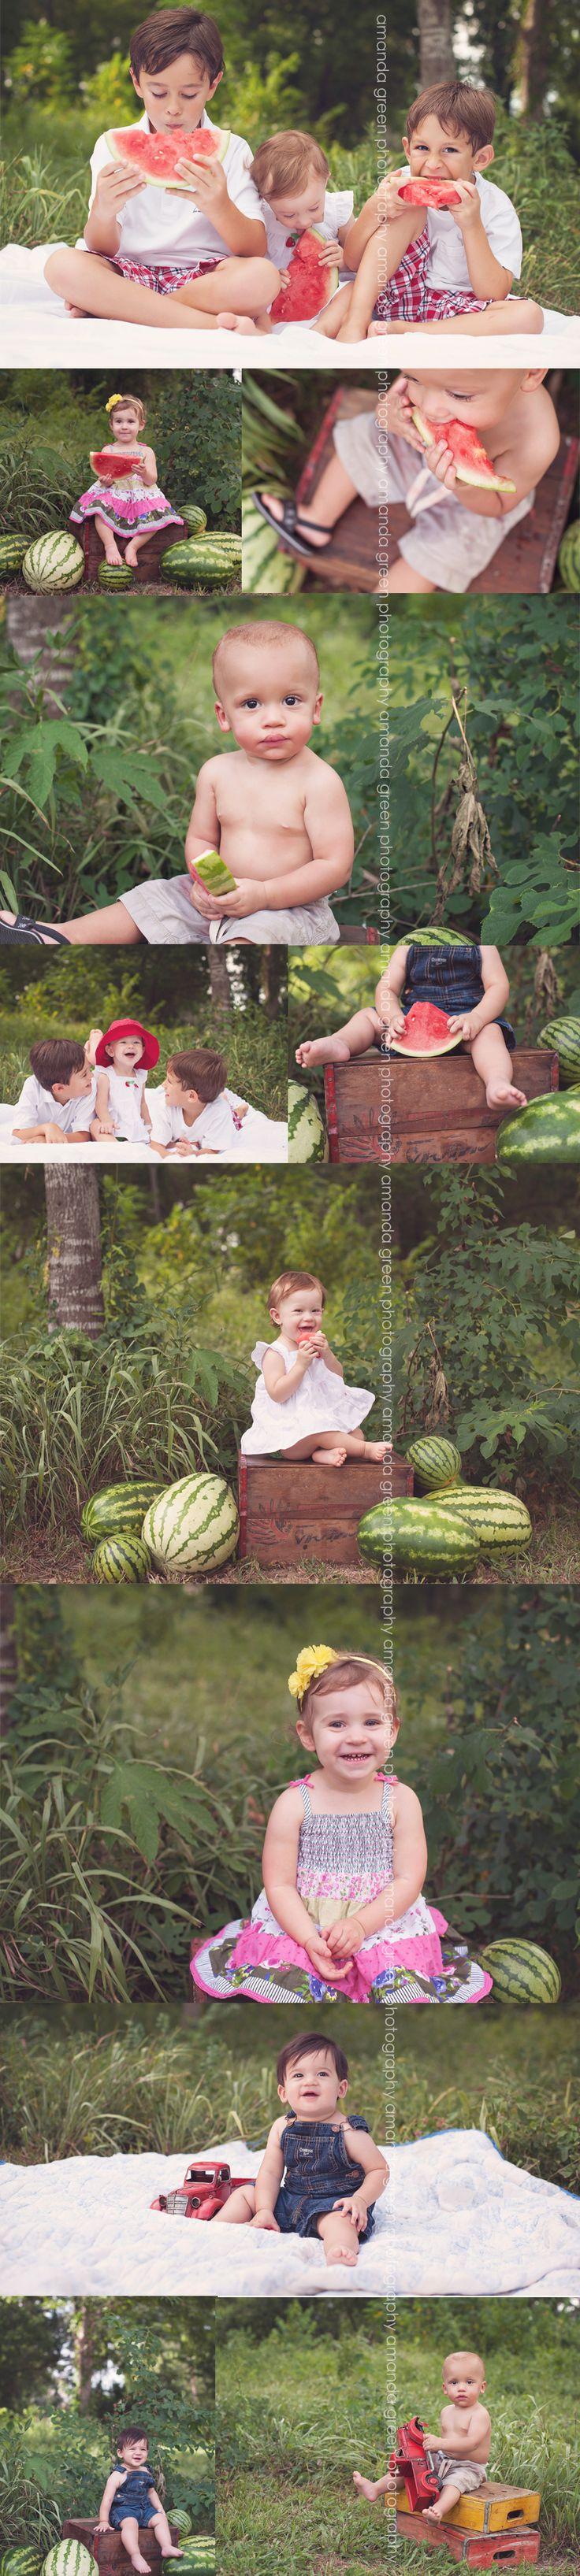 watermelon minis - summer minis - amanda green photography - katy, TX child photographer